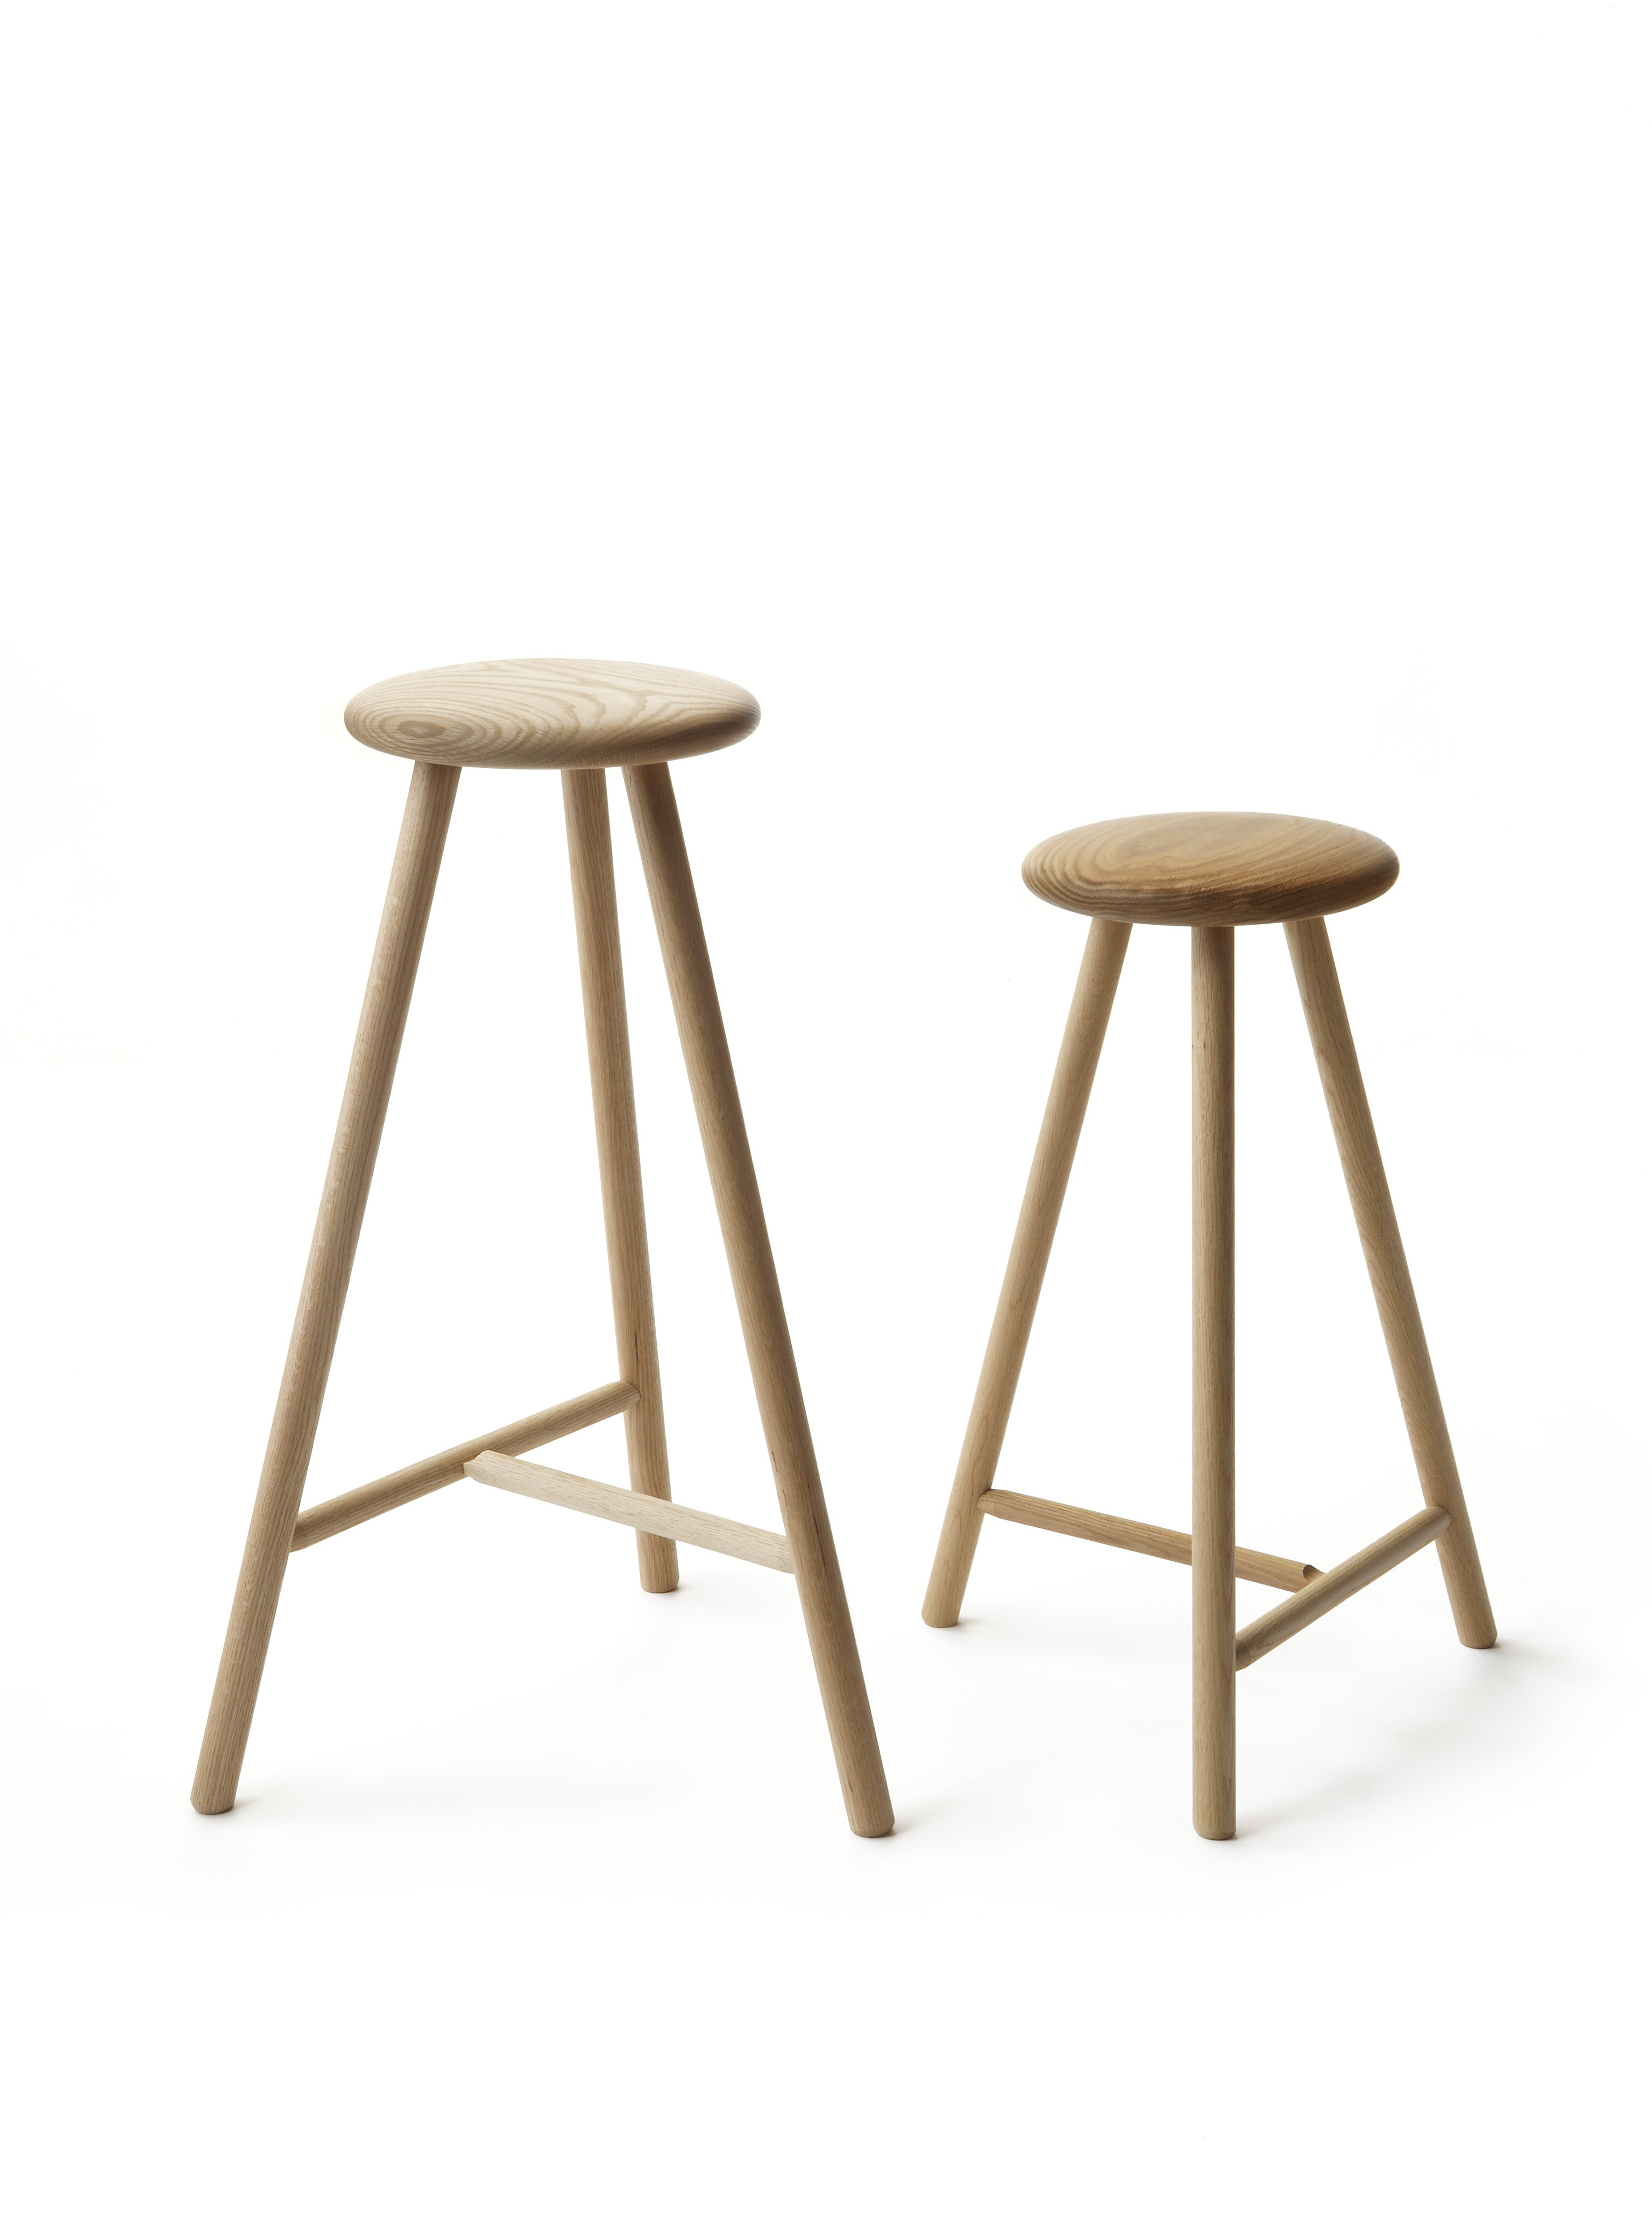 LINEA Perch High stool